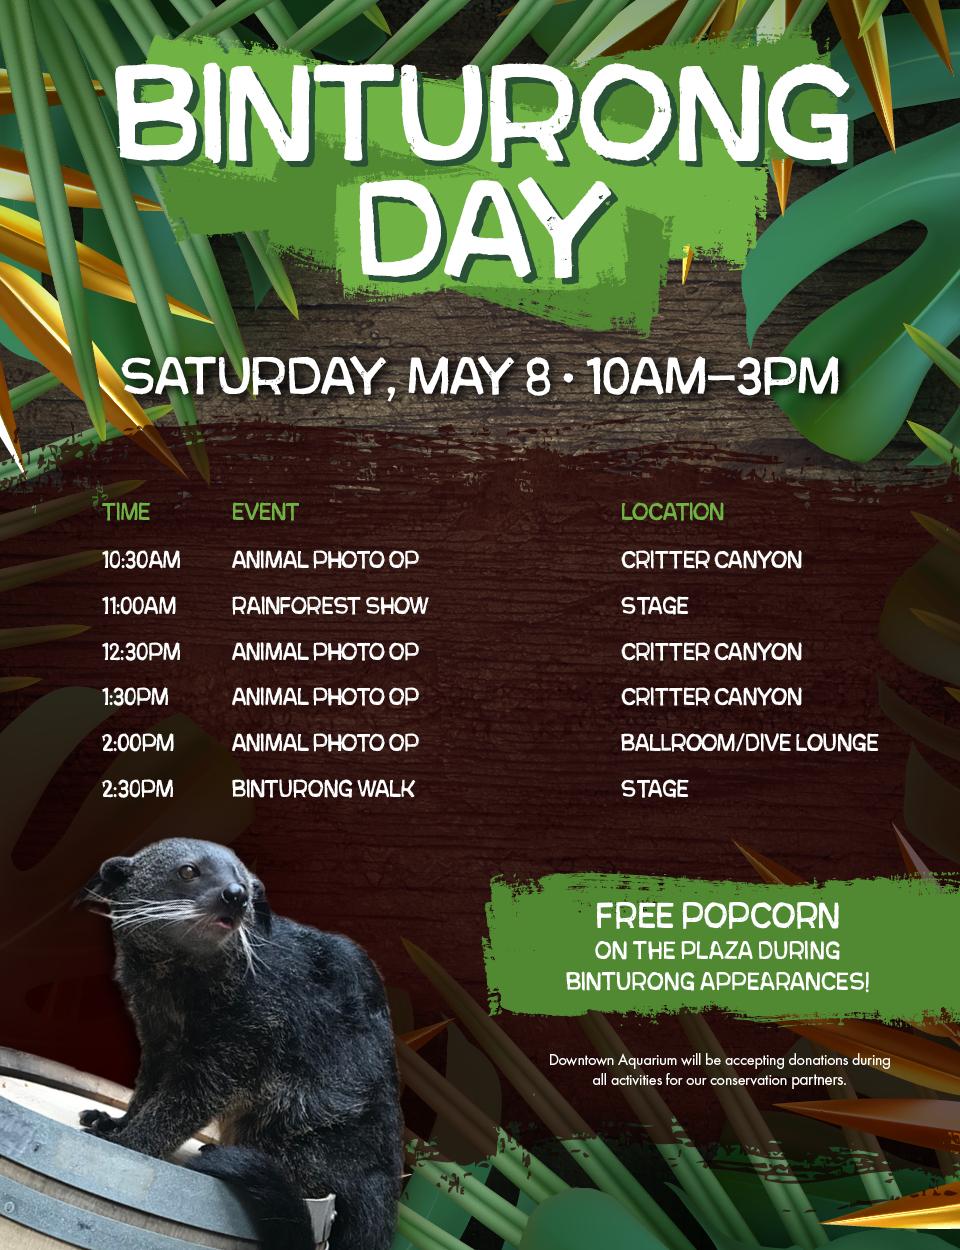 Binturong Day - Bear-Cat Sat, May 4th 10:00am - 3:00pm.